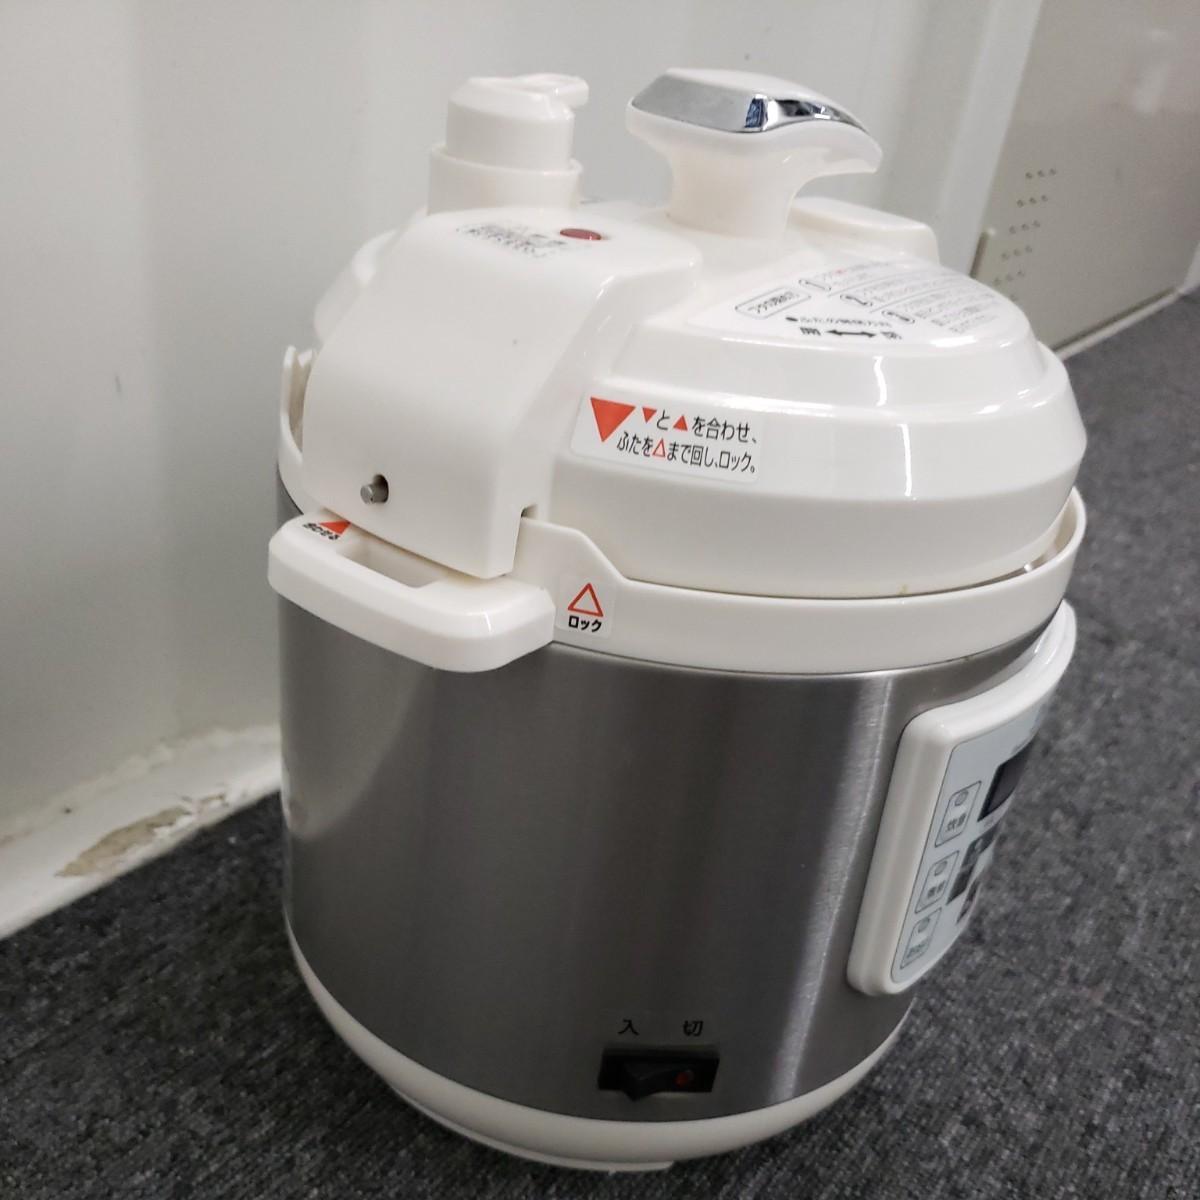 D&S 家庭用マイコン電気圧力鍋 2.5l STL-EC30